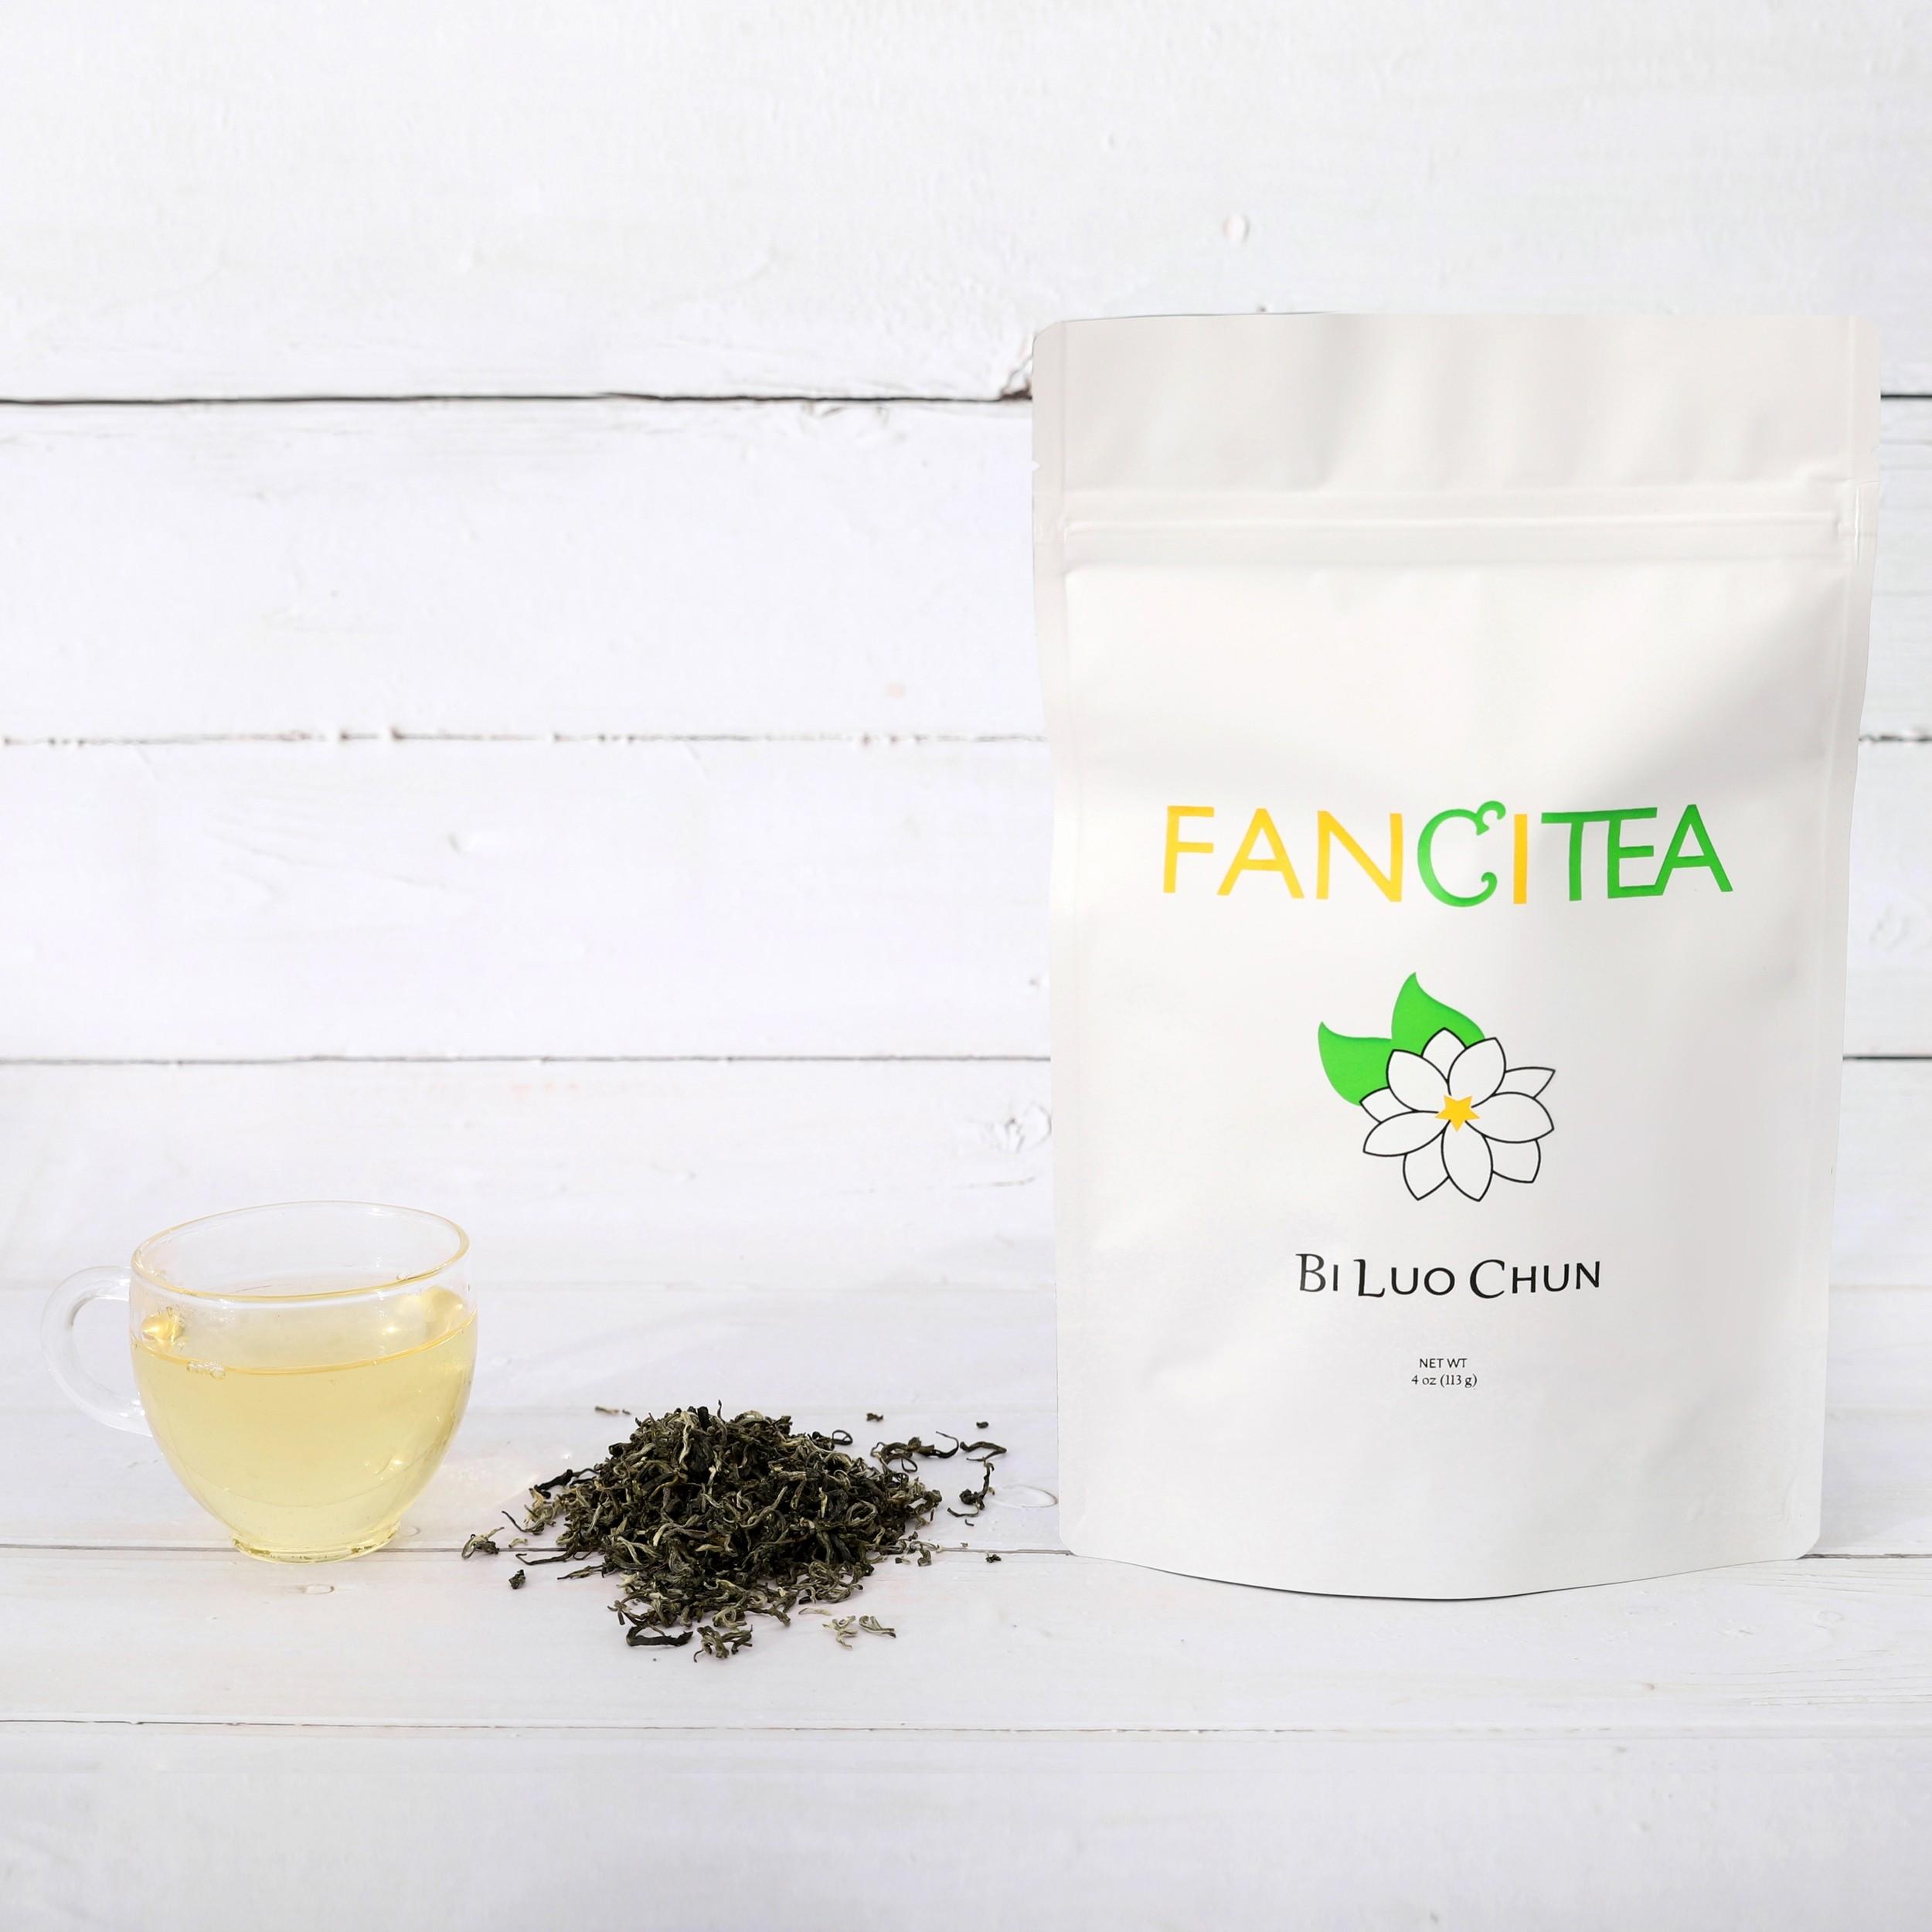 Fancitea Bi Luo Chun (Green Snail Spring) Loose Tea Leave 4oz/45 servings